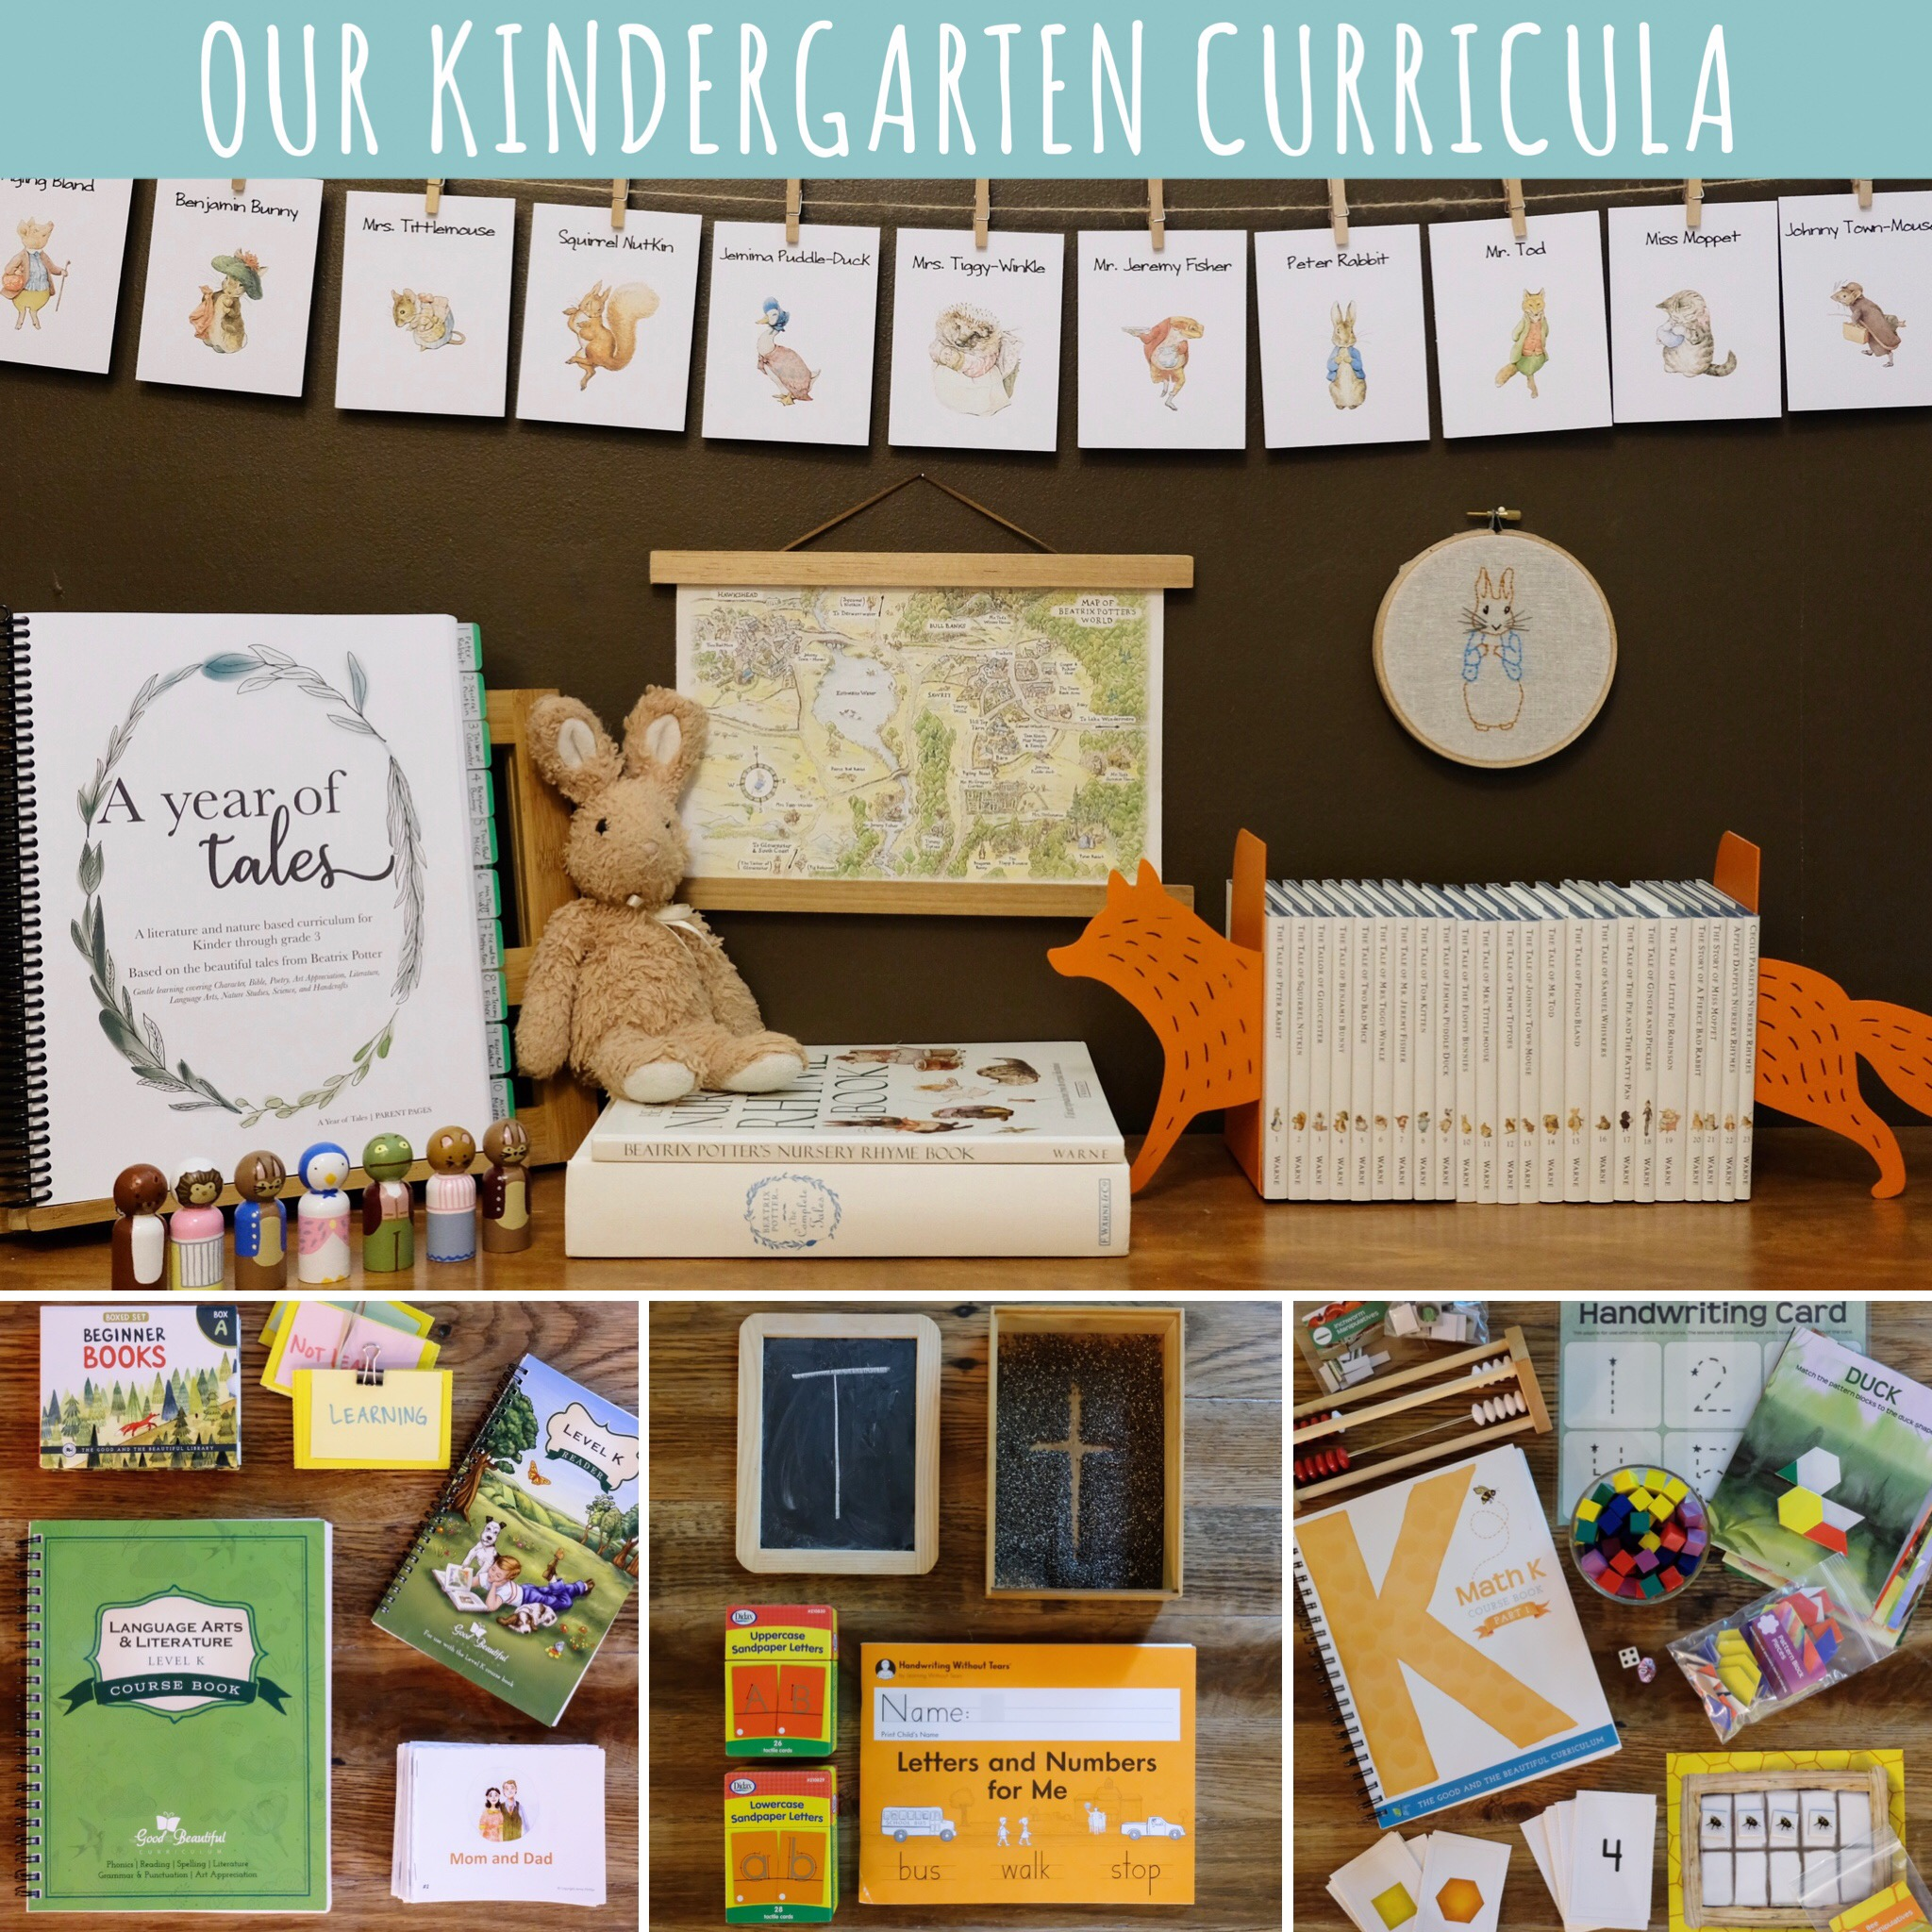 Our Kindergarten Year Curricula